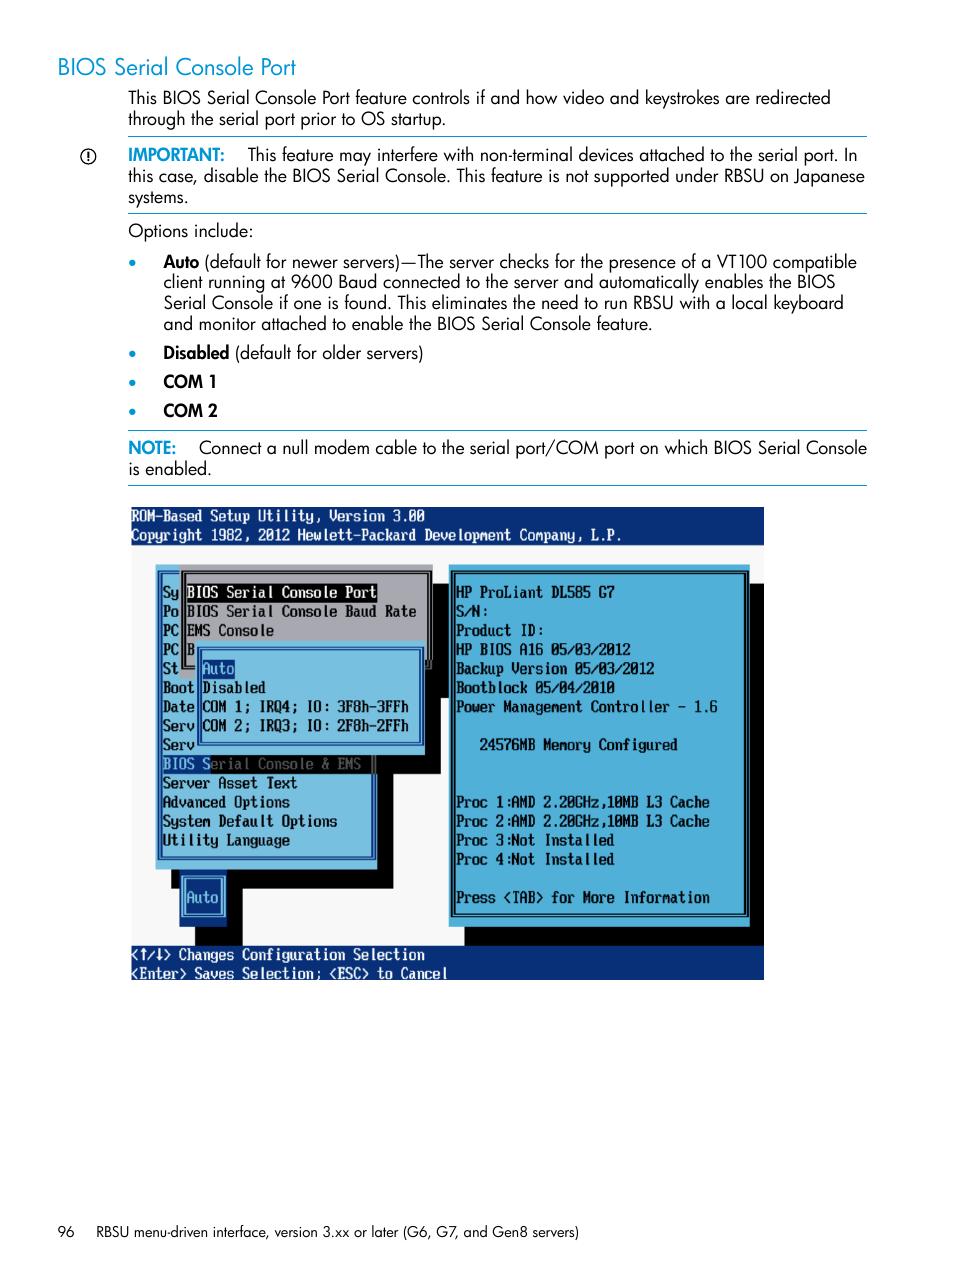 Bios serial console port | HP ROM-Based Setup Utility User Manual